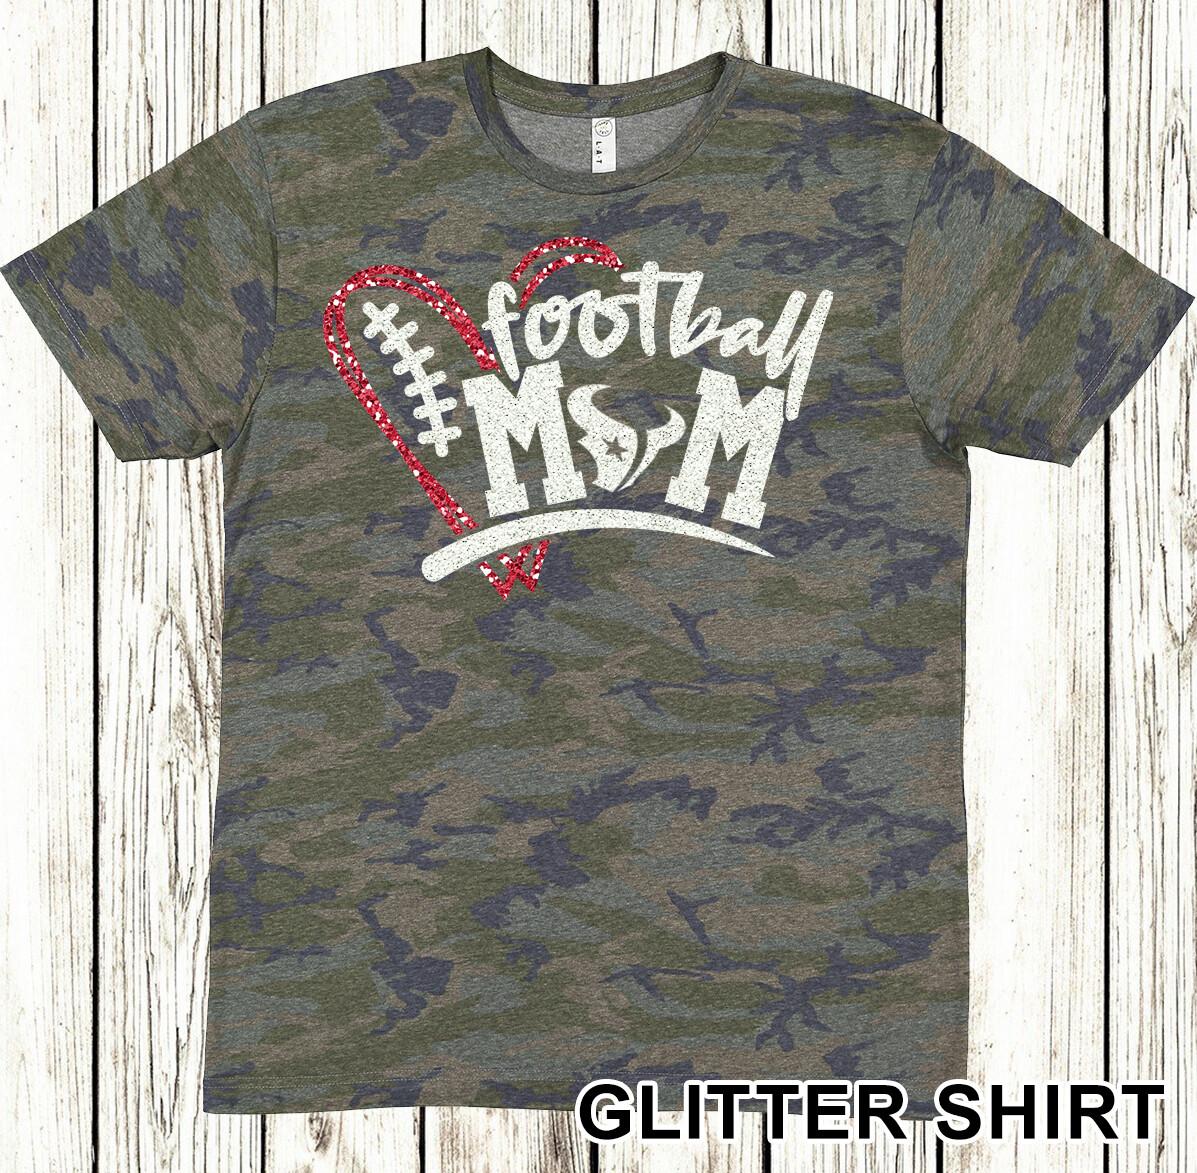 Glitter Football Mom shirt